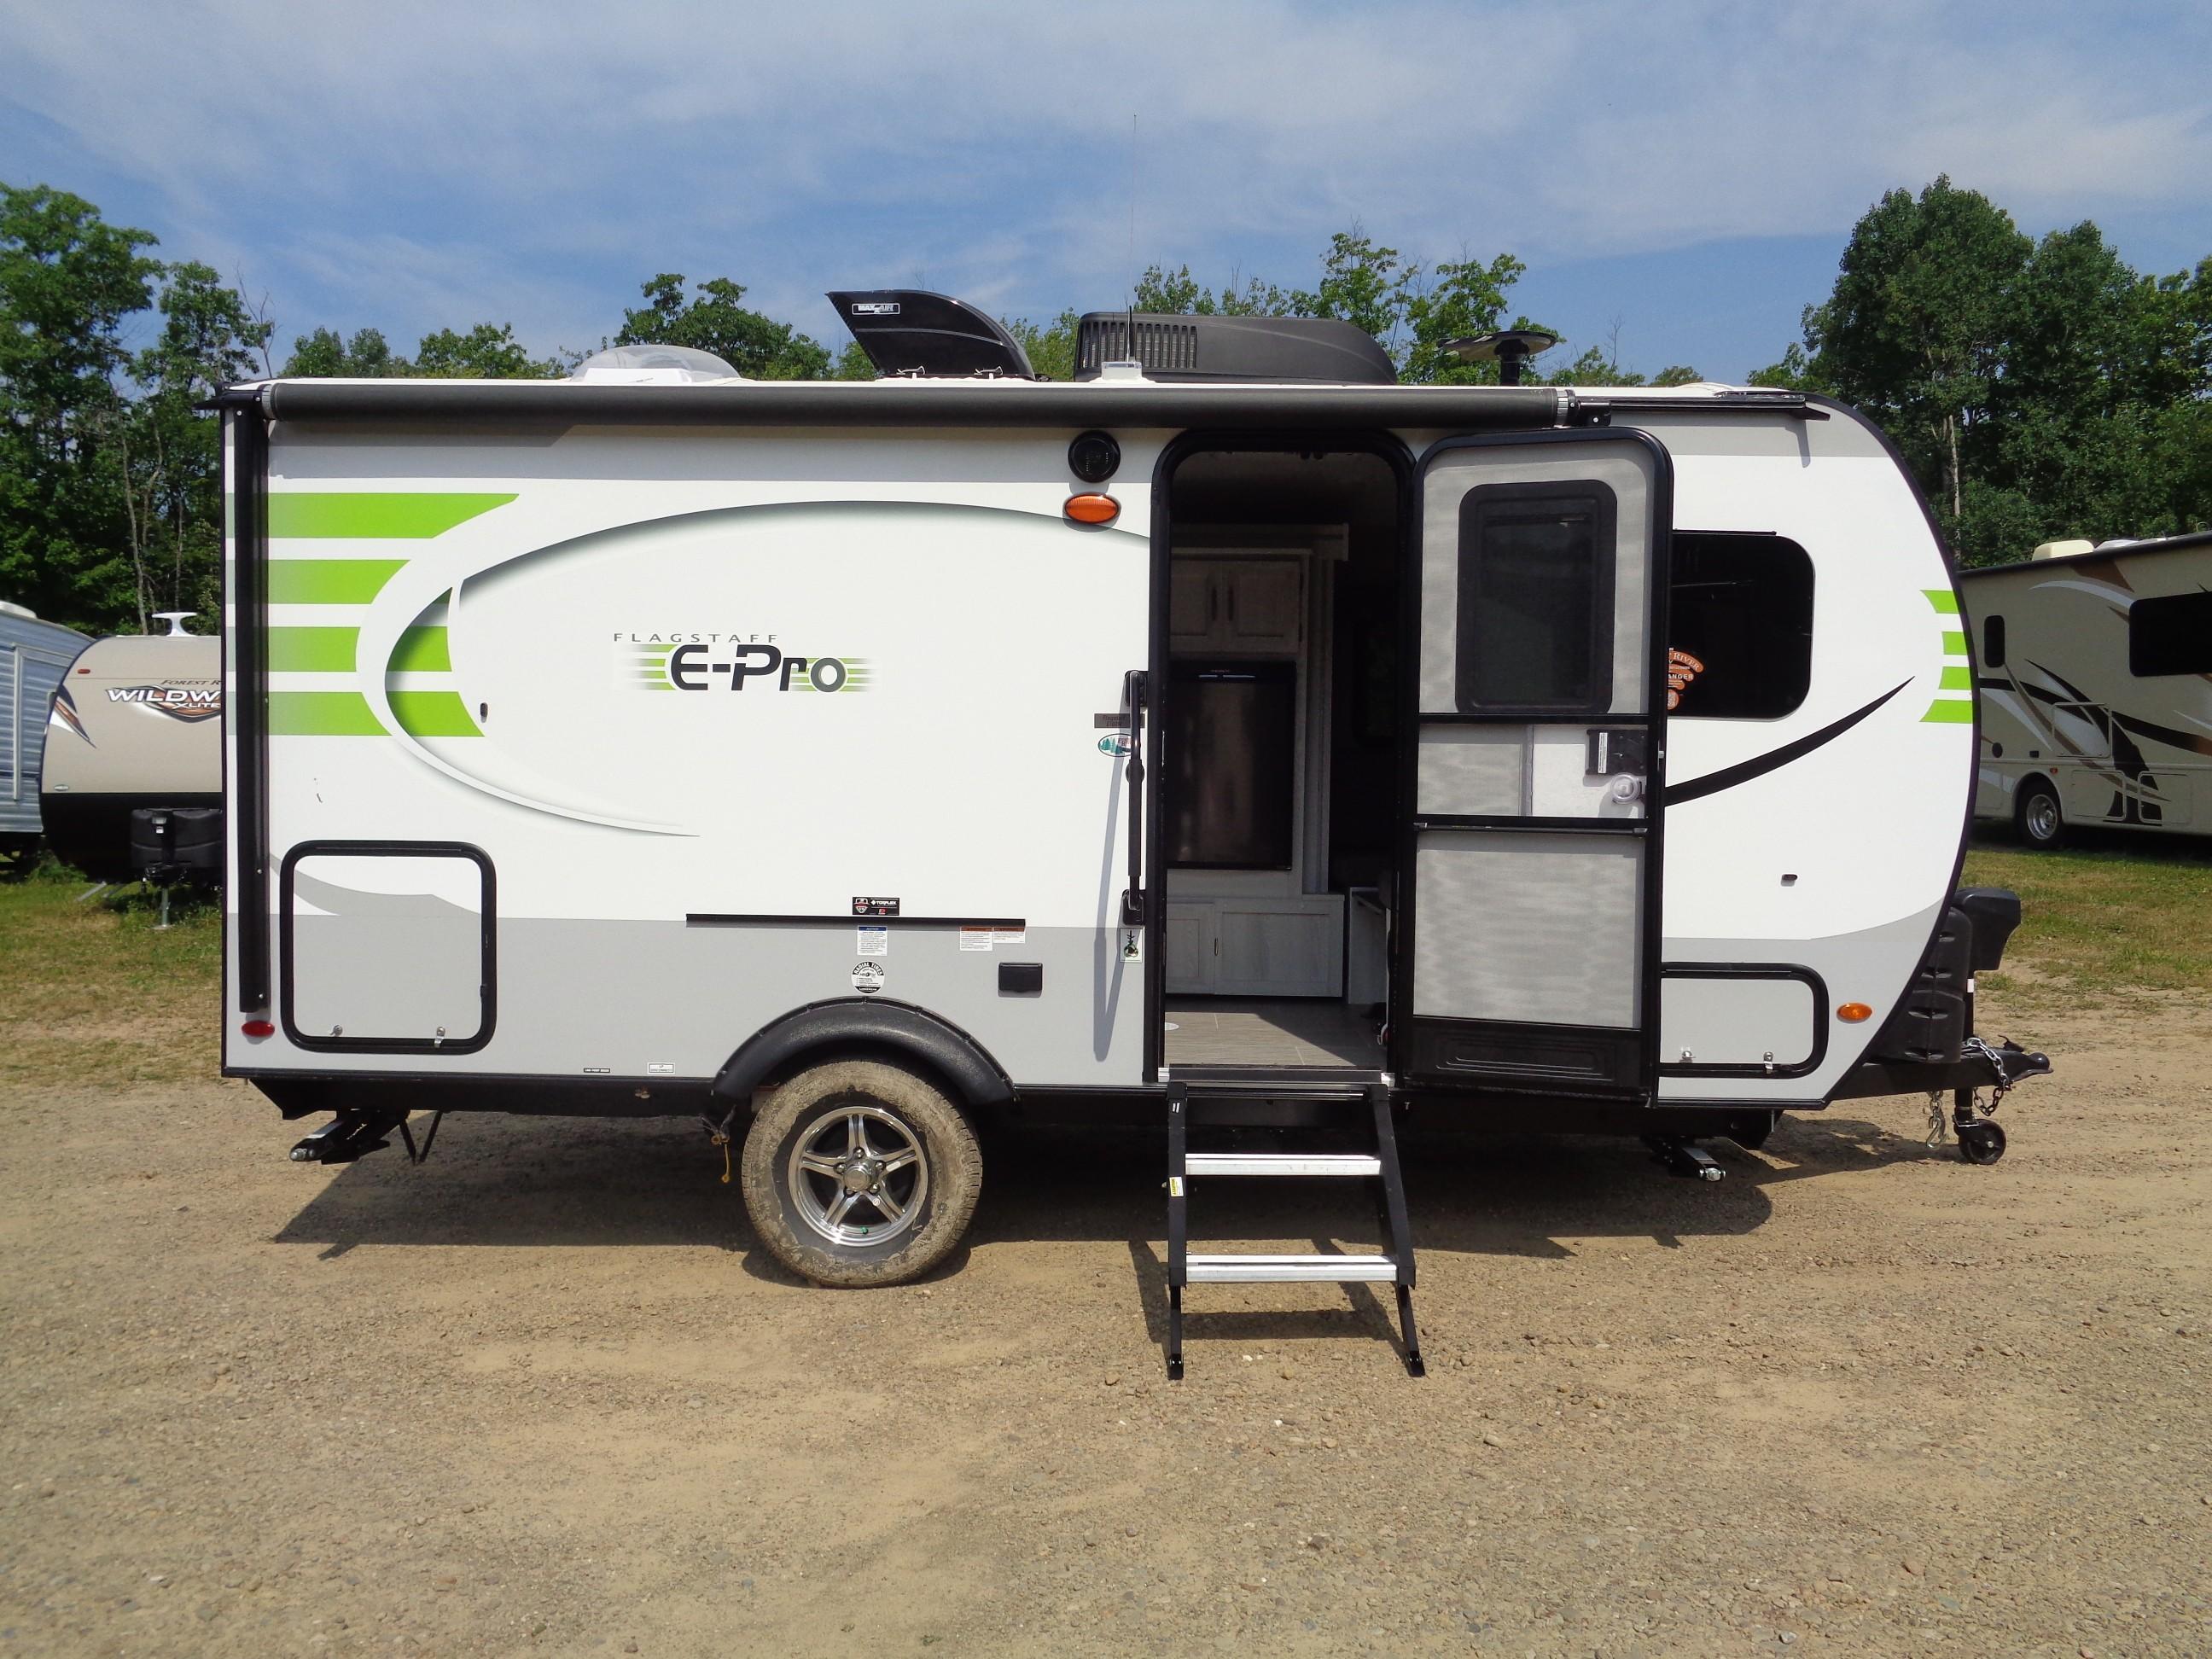 RV Dealer in PA - Pop-Up Camper, 5th Wheel & Travel Trailers